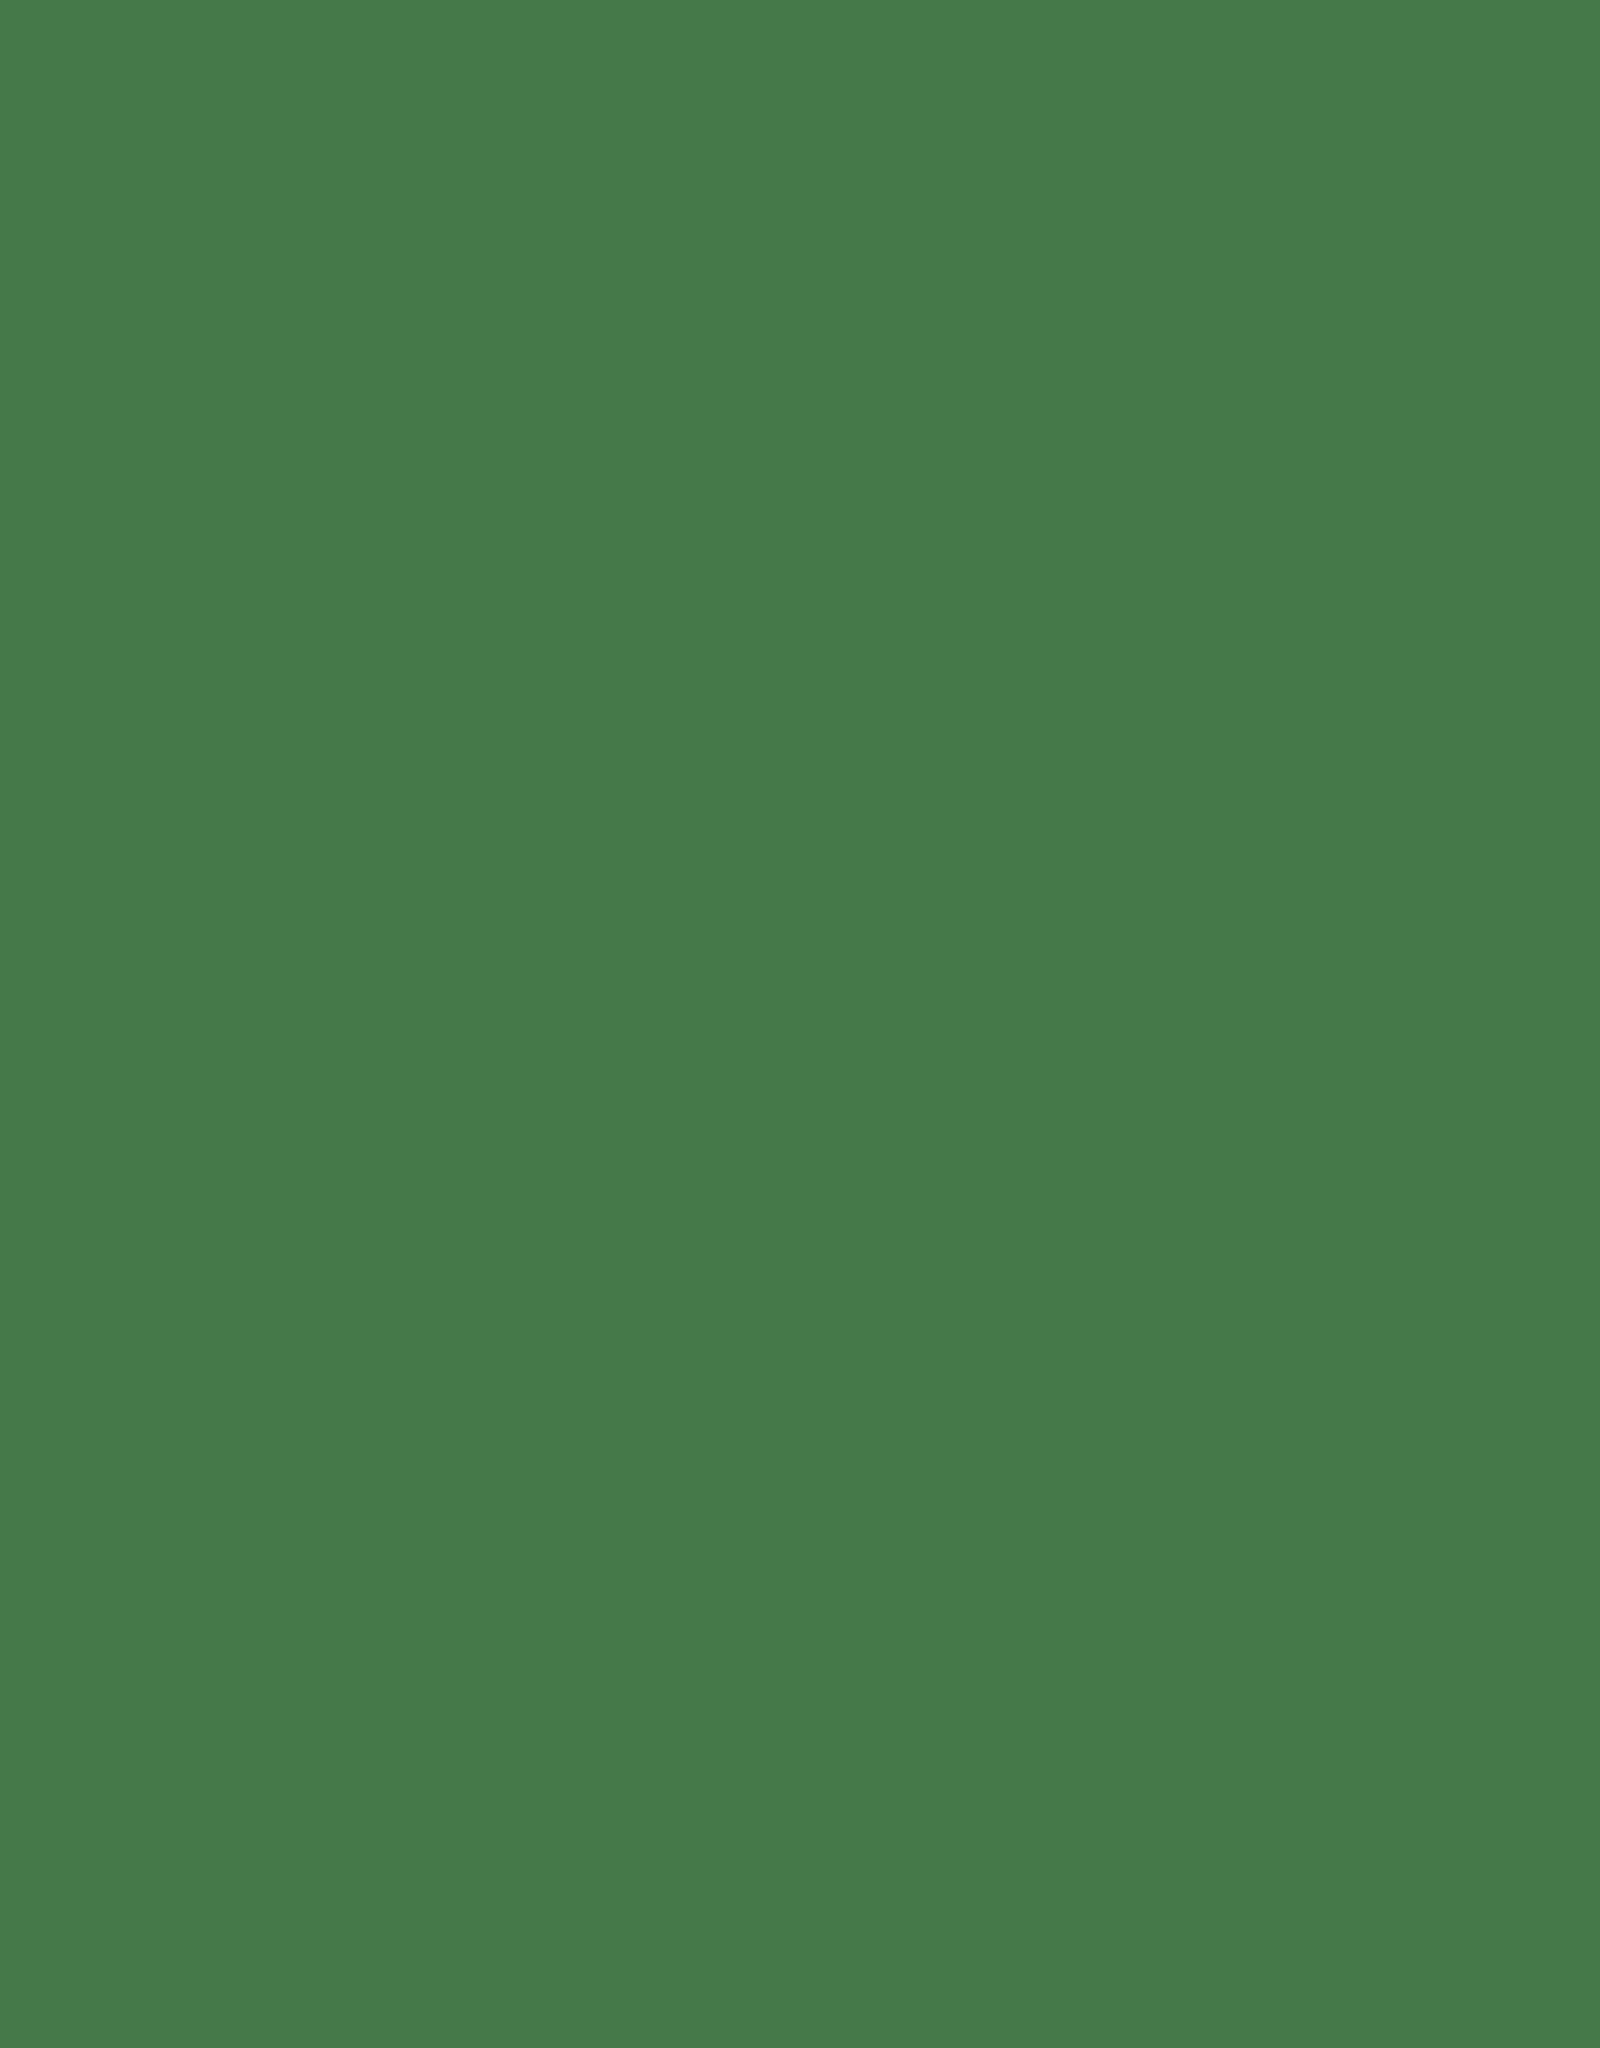 Sennelier, Extra Fine Soft Pastel, Moss Gray Green